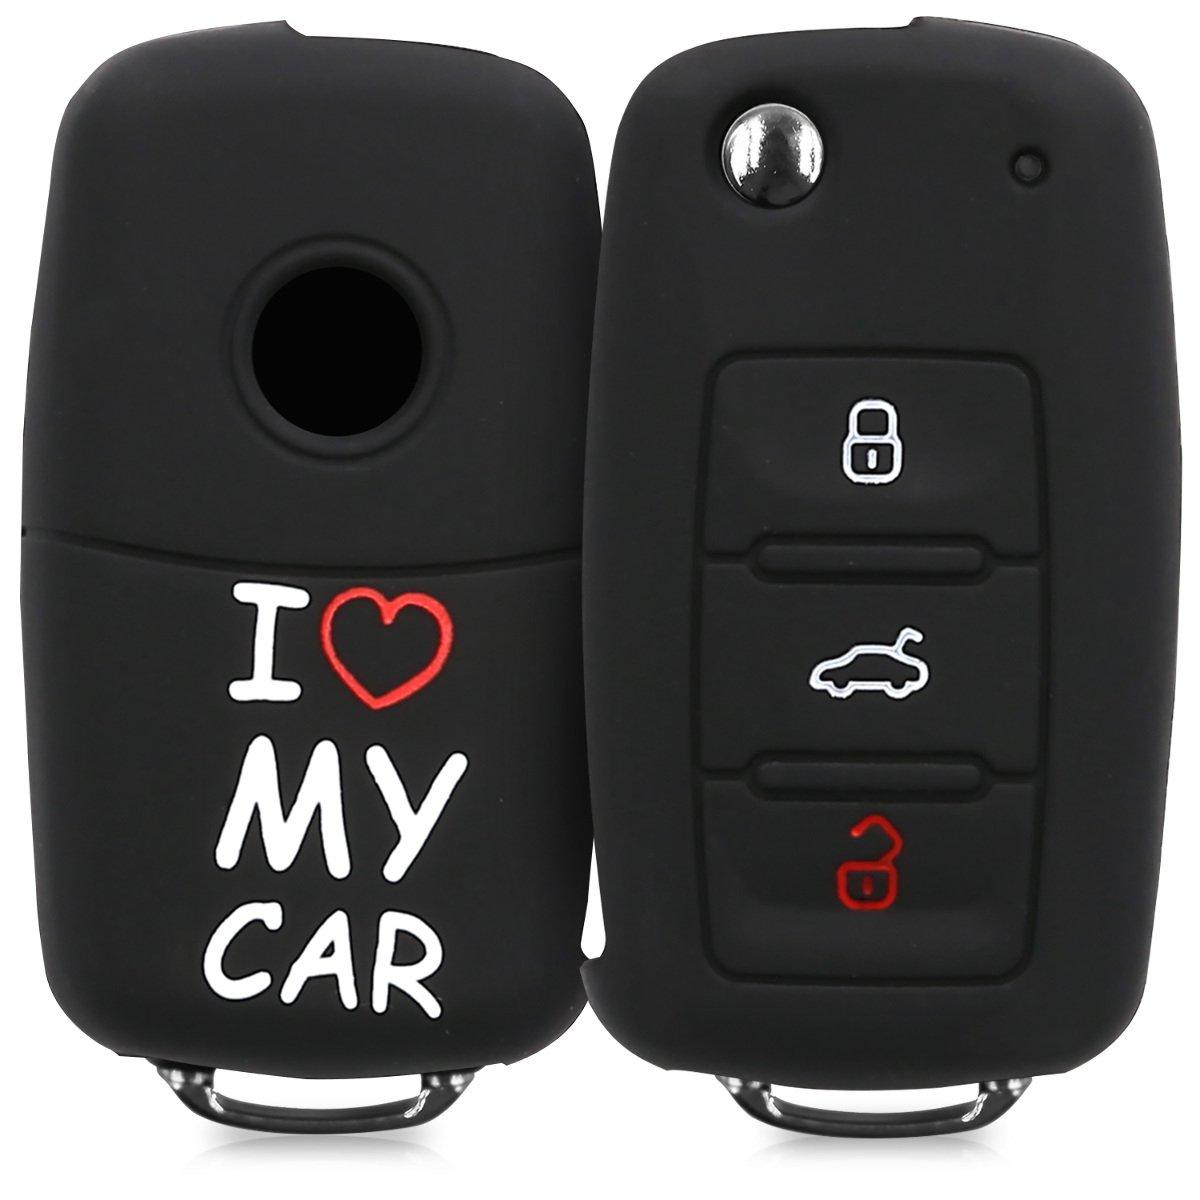 .I Love My Car white / red / black